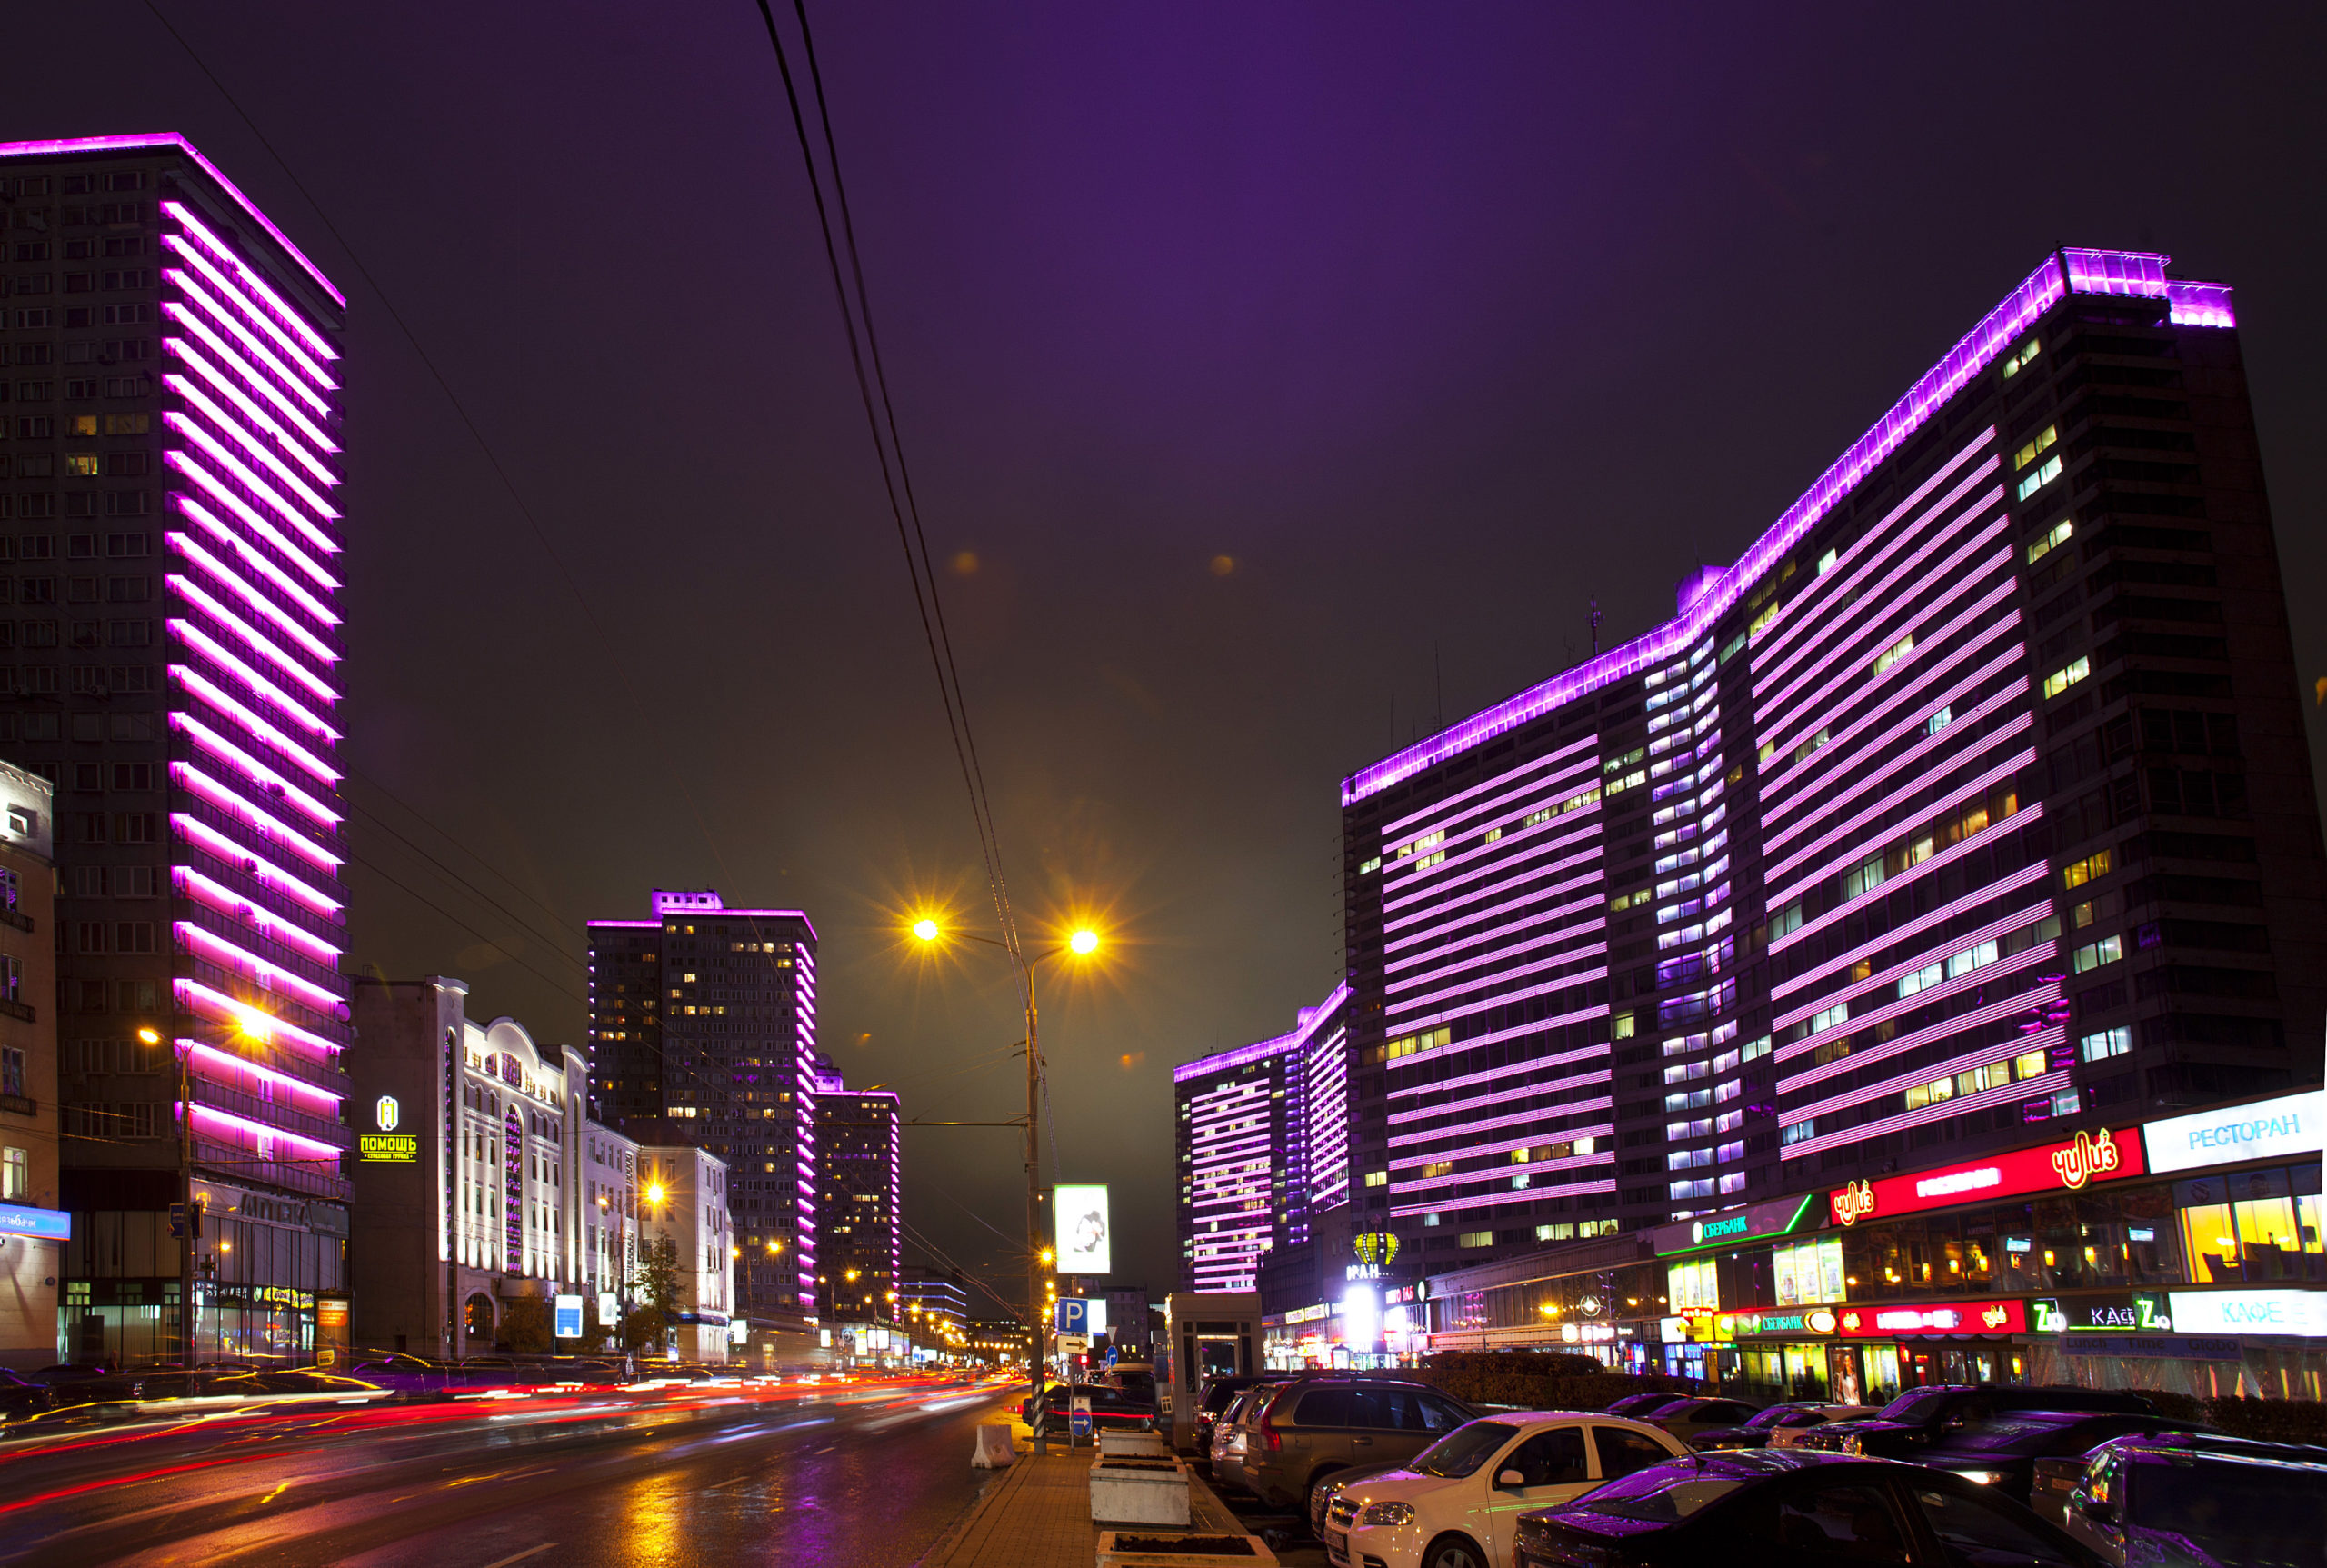 Медиафасады на улице Новый Арбат, Москва